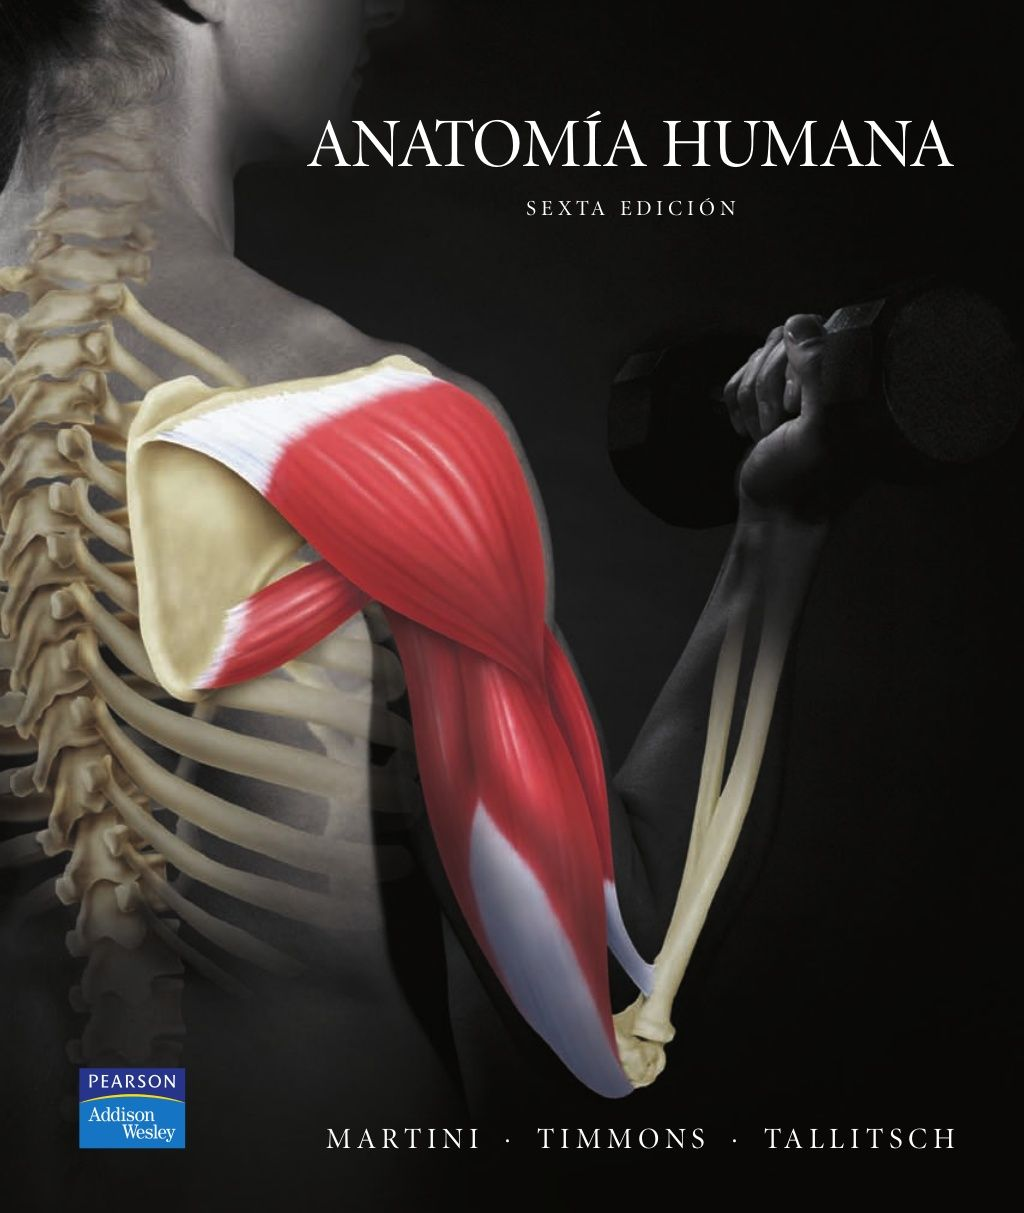 Anatomía humana by Paco R via slideshare   anatomía   Pinterest ...